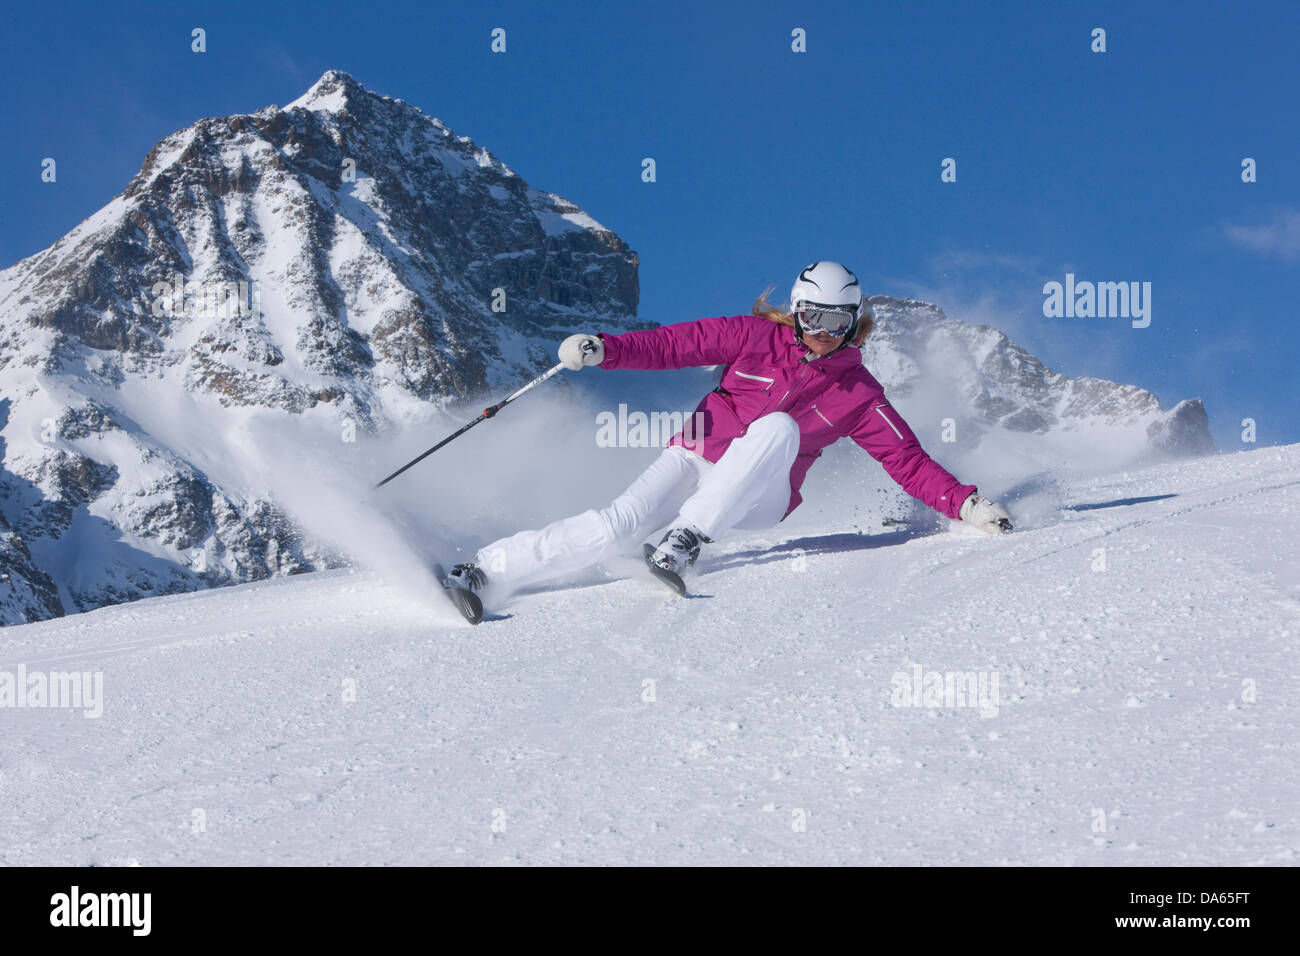 Skiing, winter sports, skiing area, Corviglia, ski, skiing, winter sports, Carving, winter, sport, spare time, leisure, - Stock Image